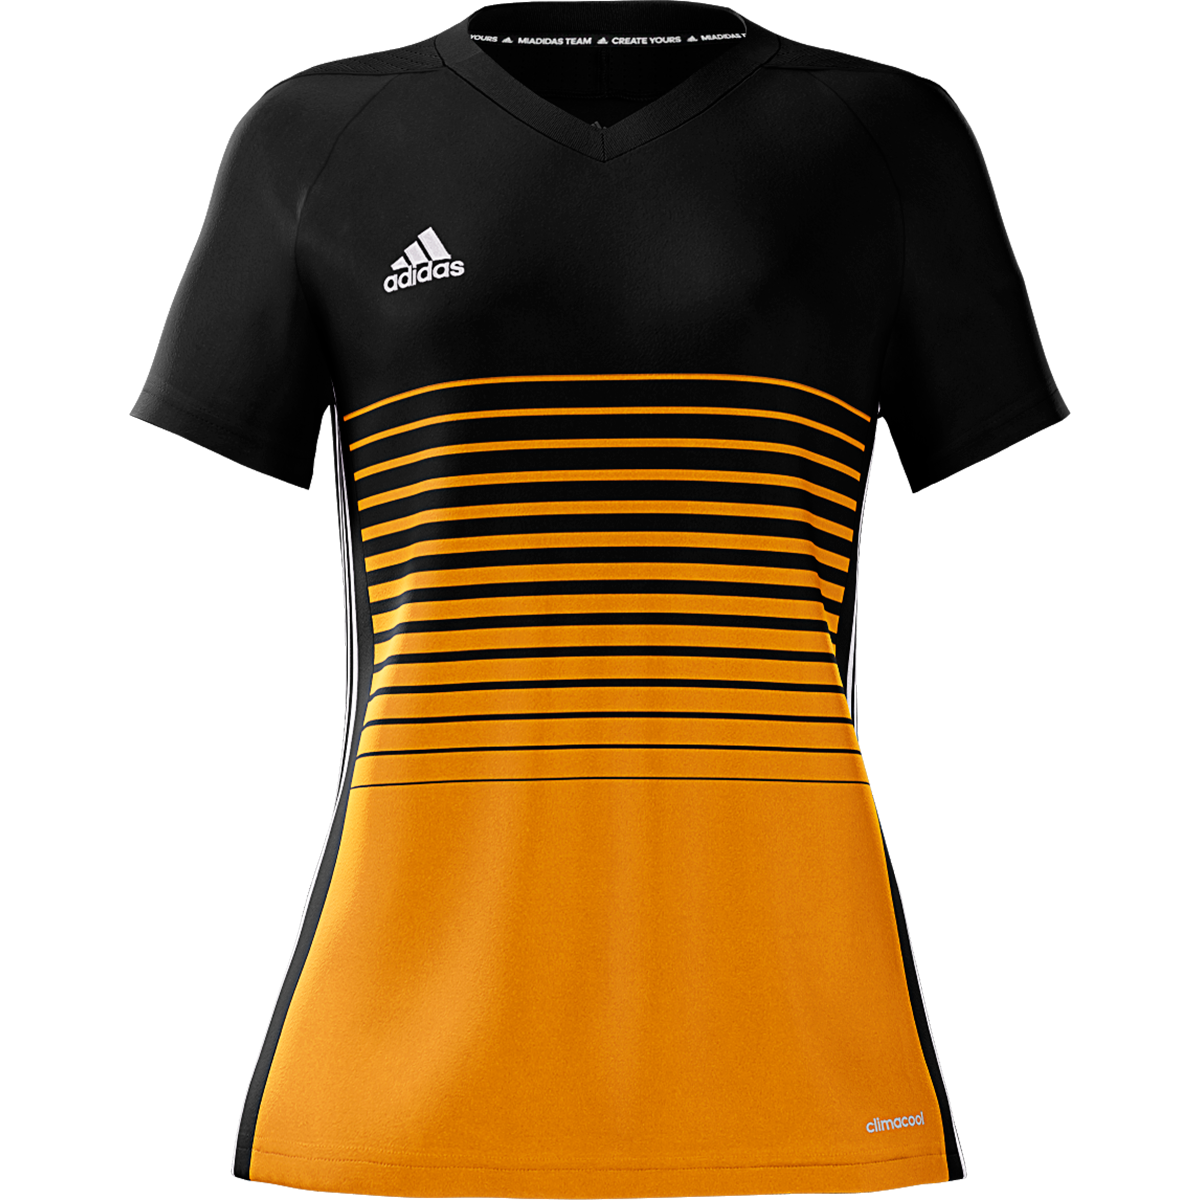 Adidas Women's Lynx Jersey - Black-black/gold-2xl | Adidas women ...